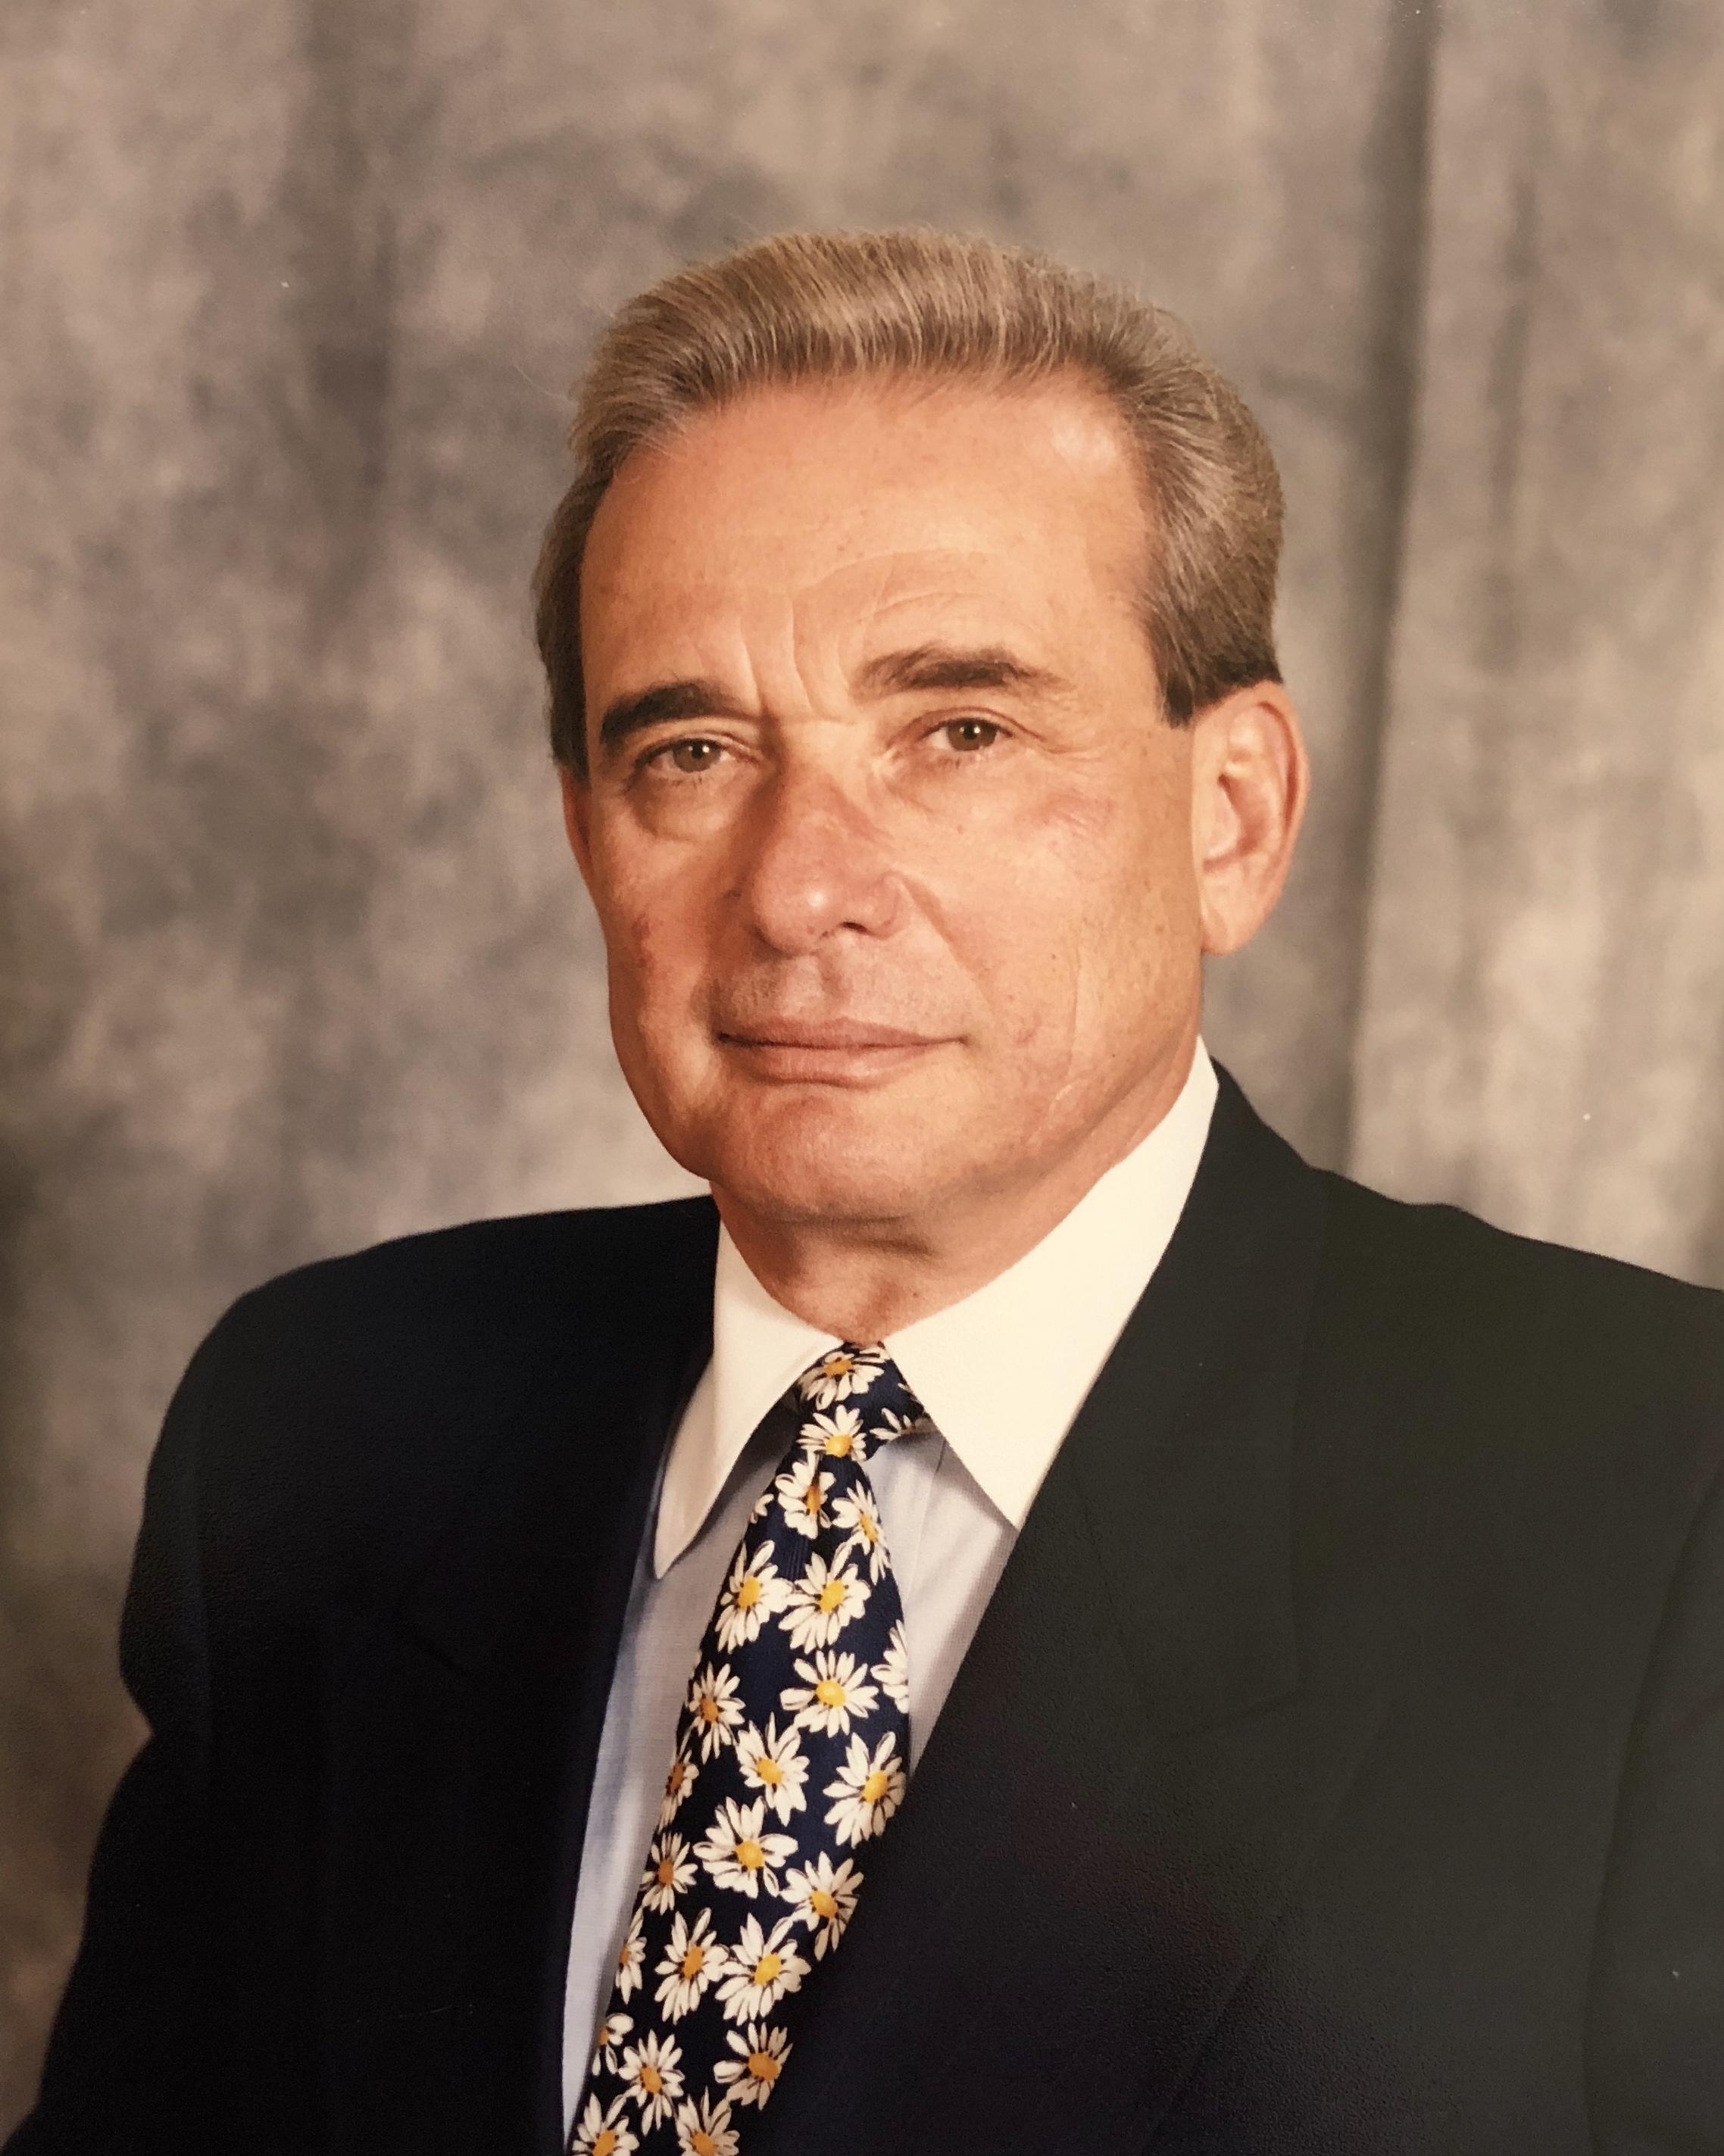 JOEL SPIRO, MD